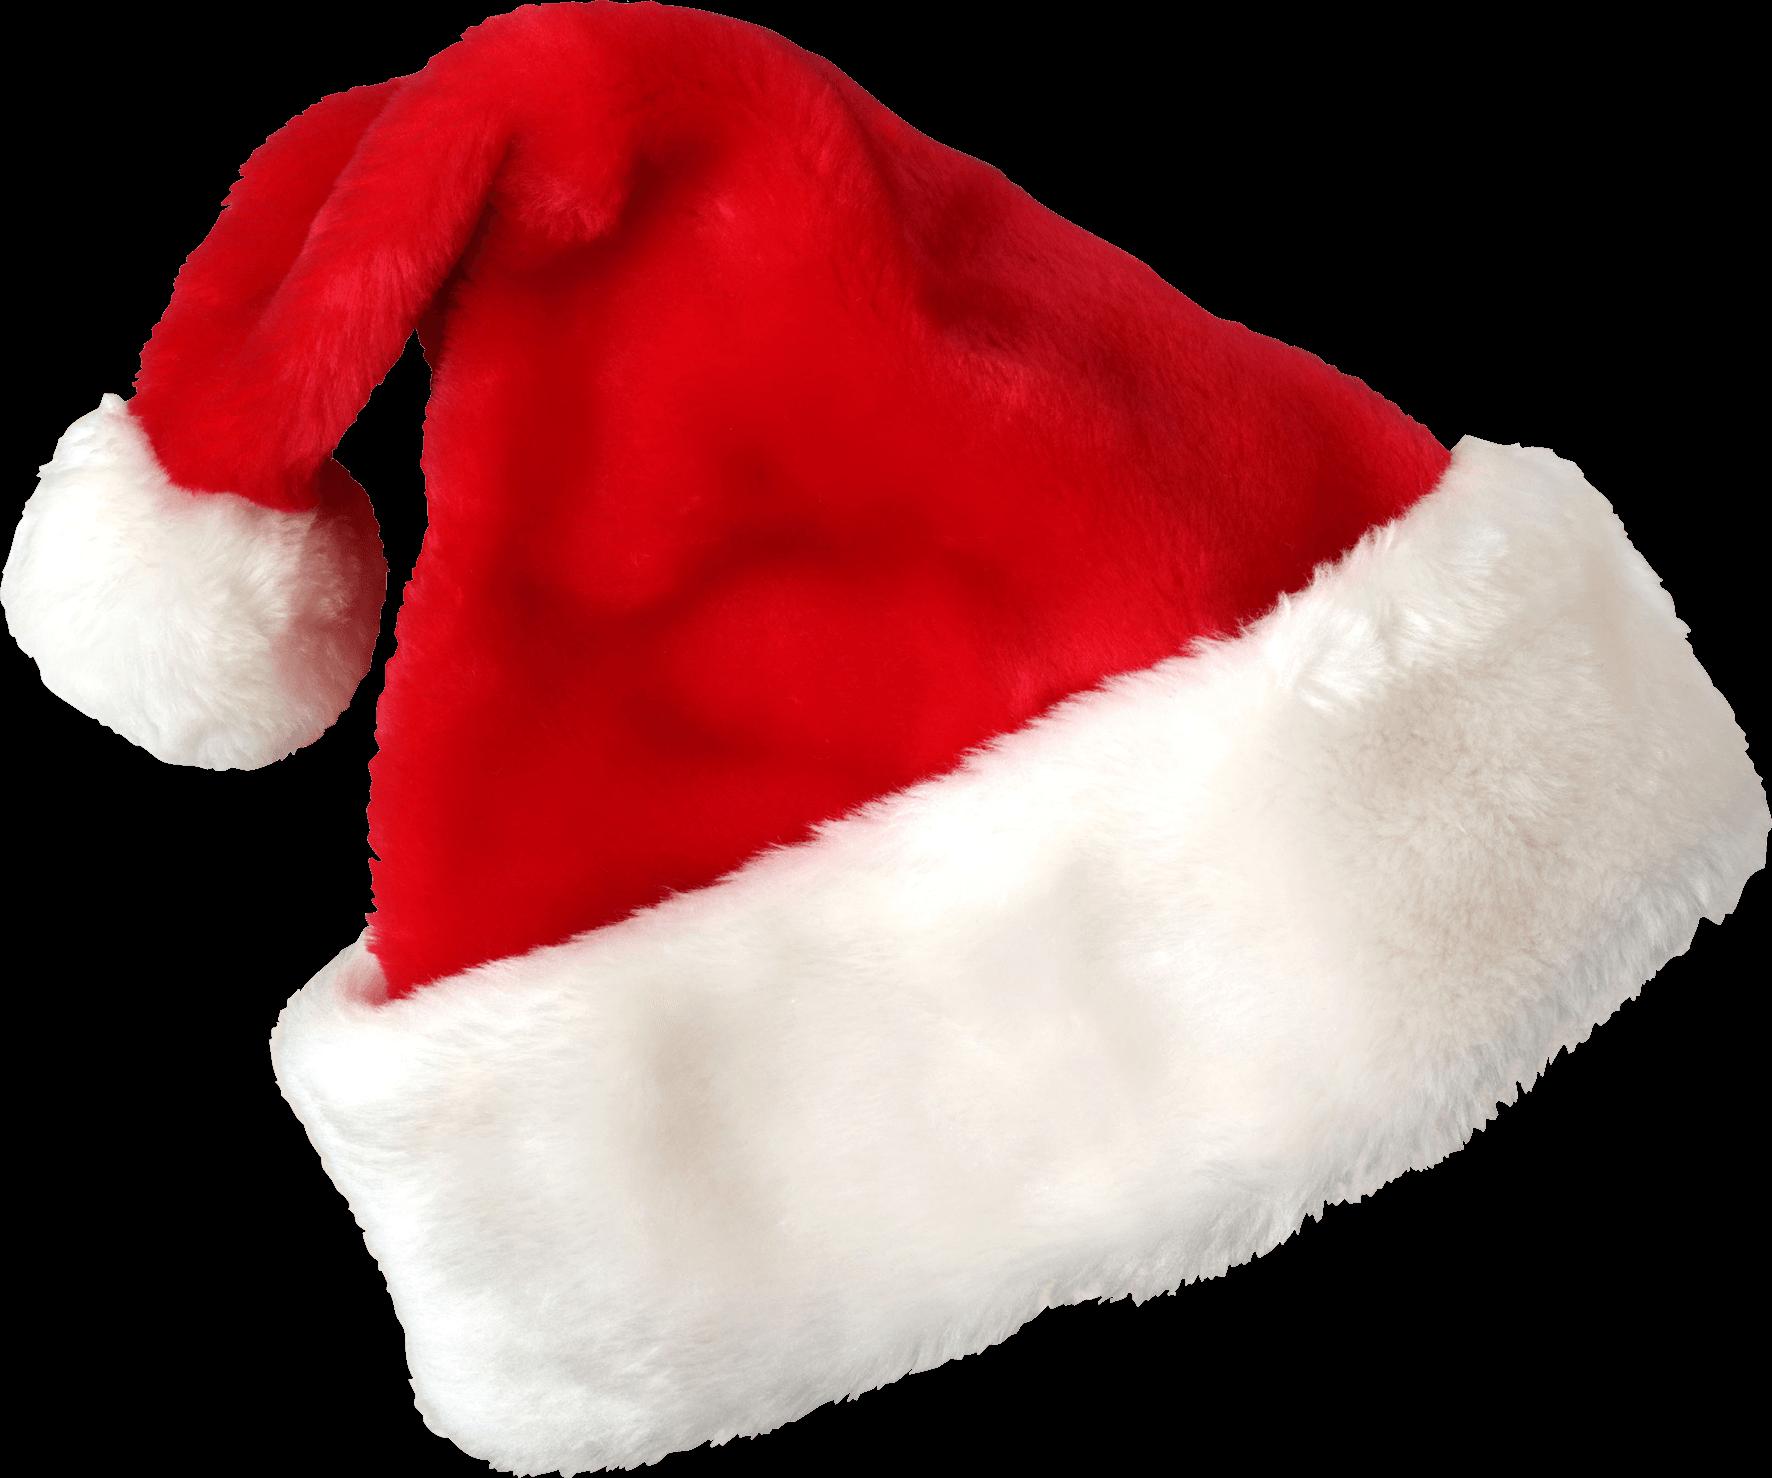 Transparent Christmas Hat.Hat Santa Claus Christmas Transparent Png Stickpng